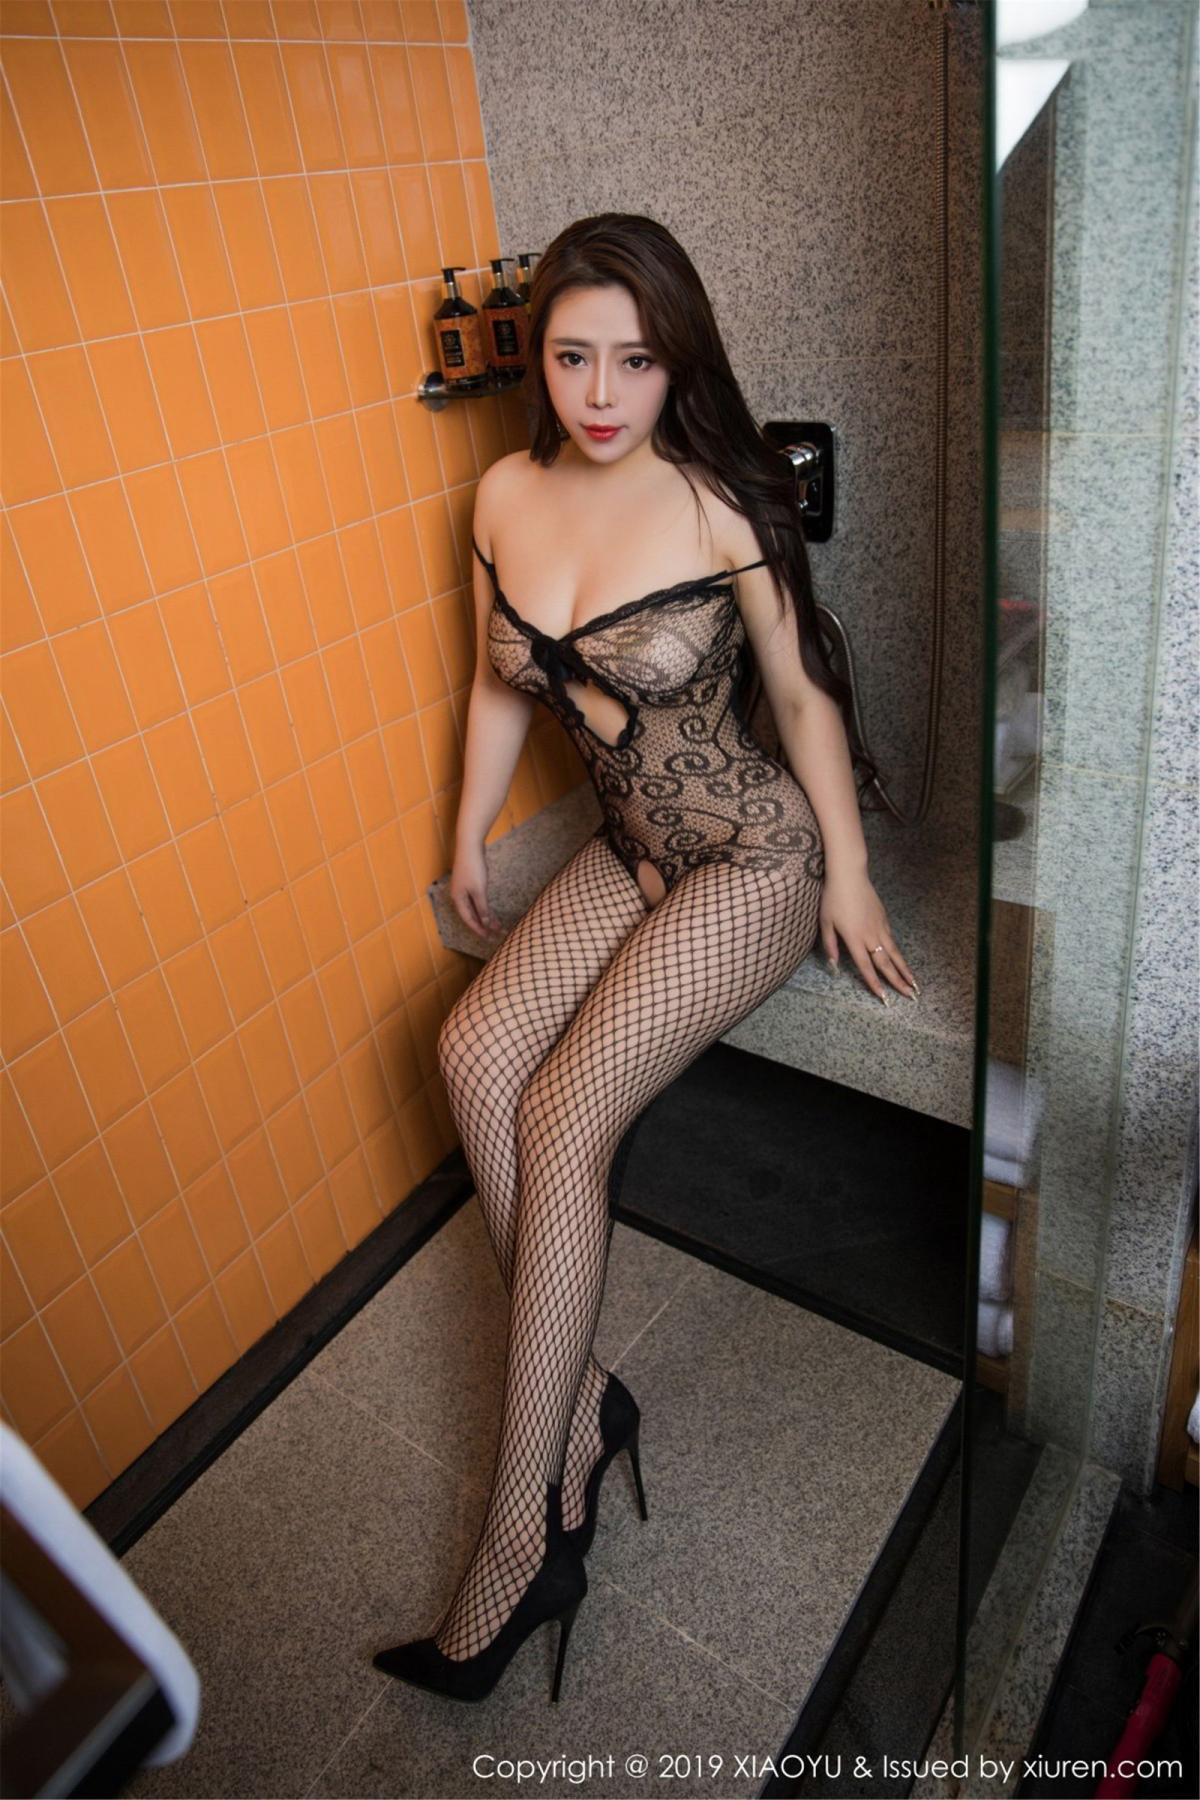 [XiaoYu] Vol.058 Miki Tu 42P, Miki Tu, XiaoYu